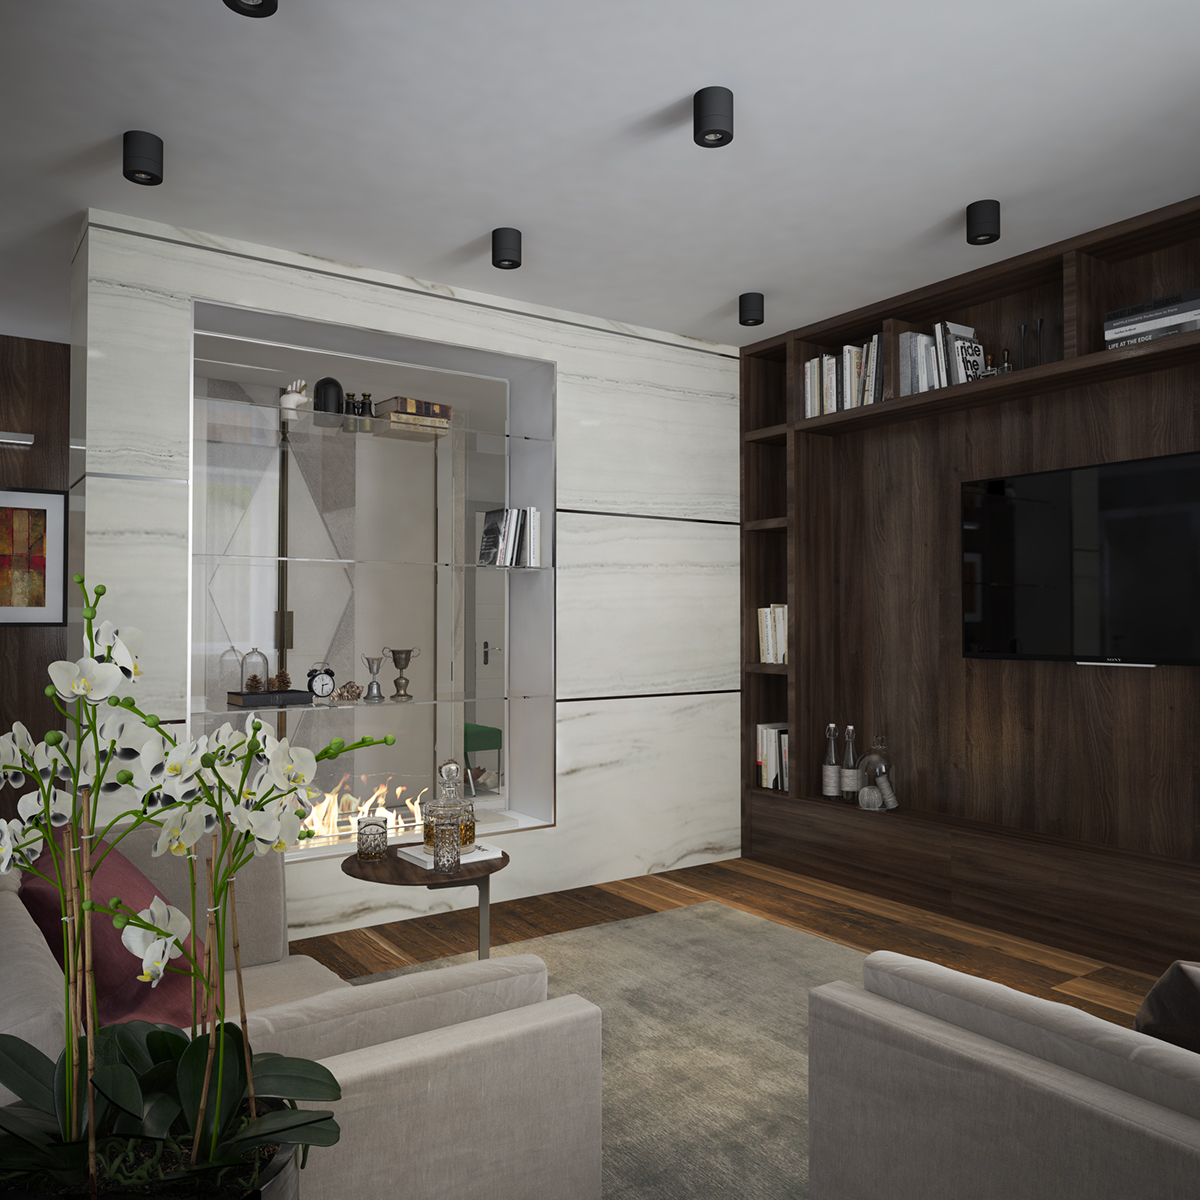 #3D #livingroom